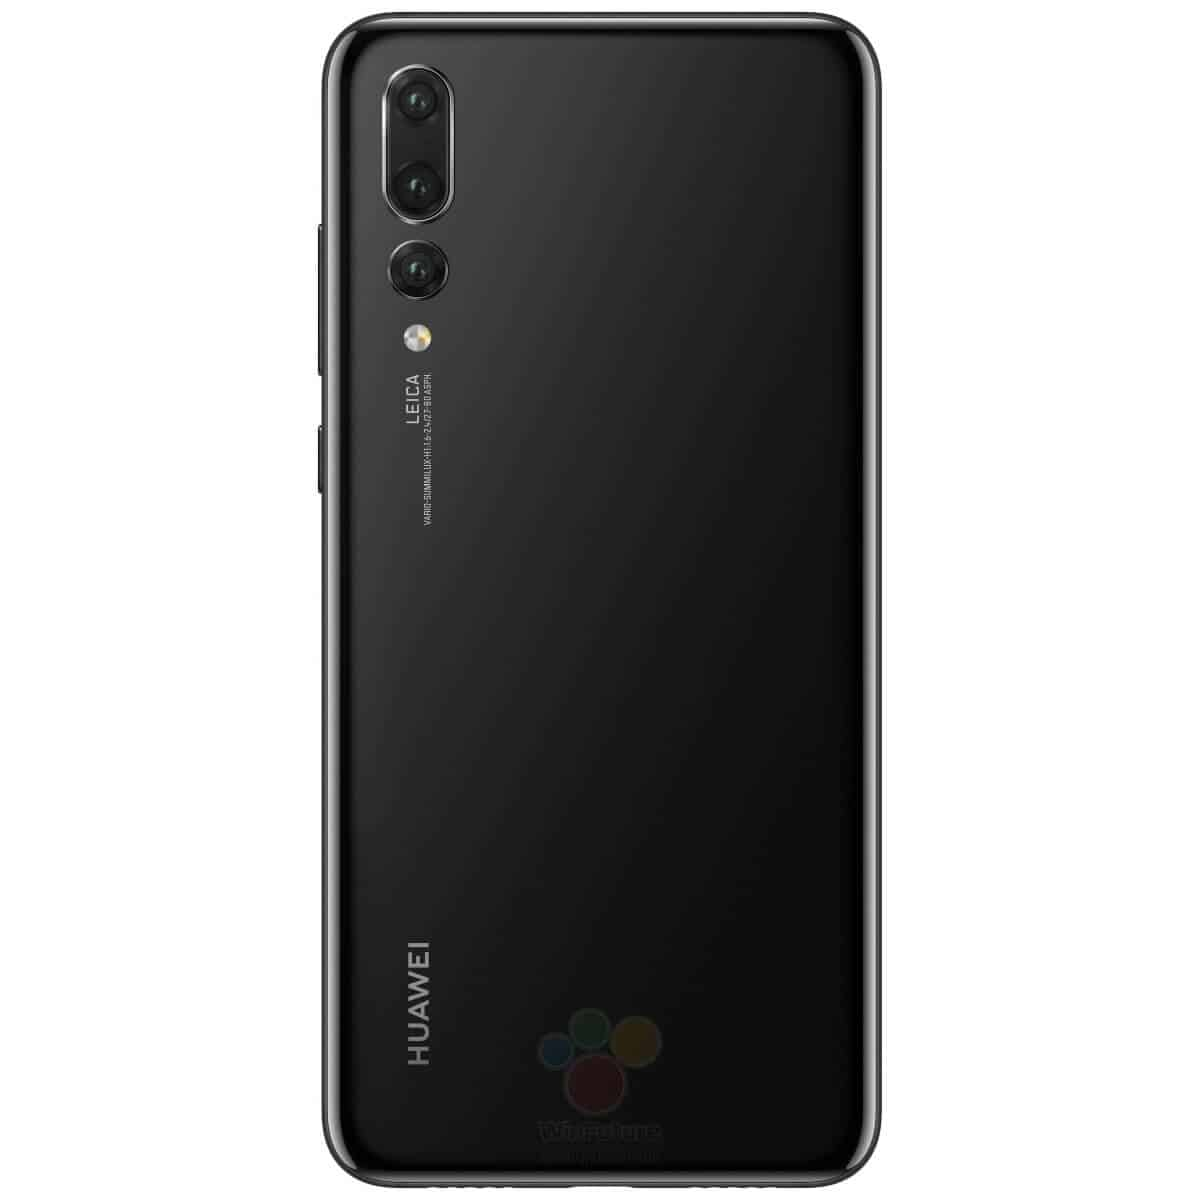 Huawei P20 Pro Press Renders 9